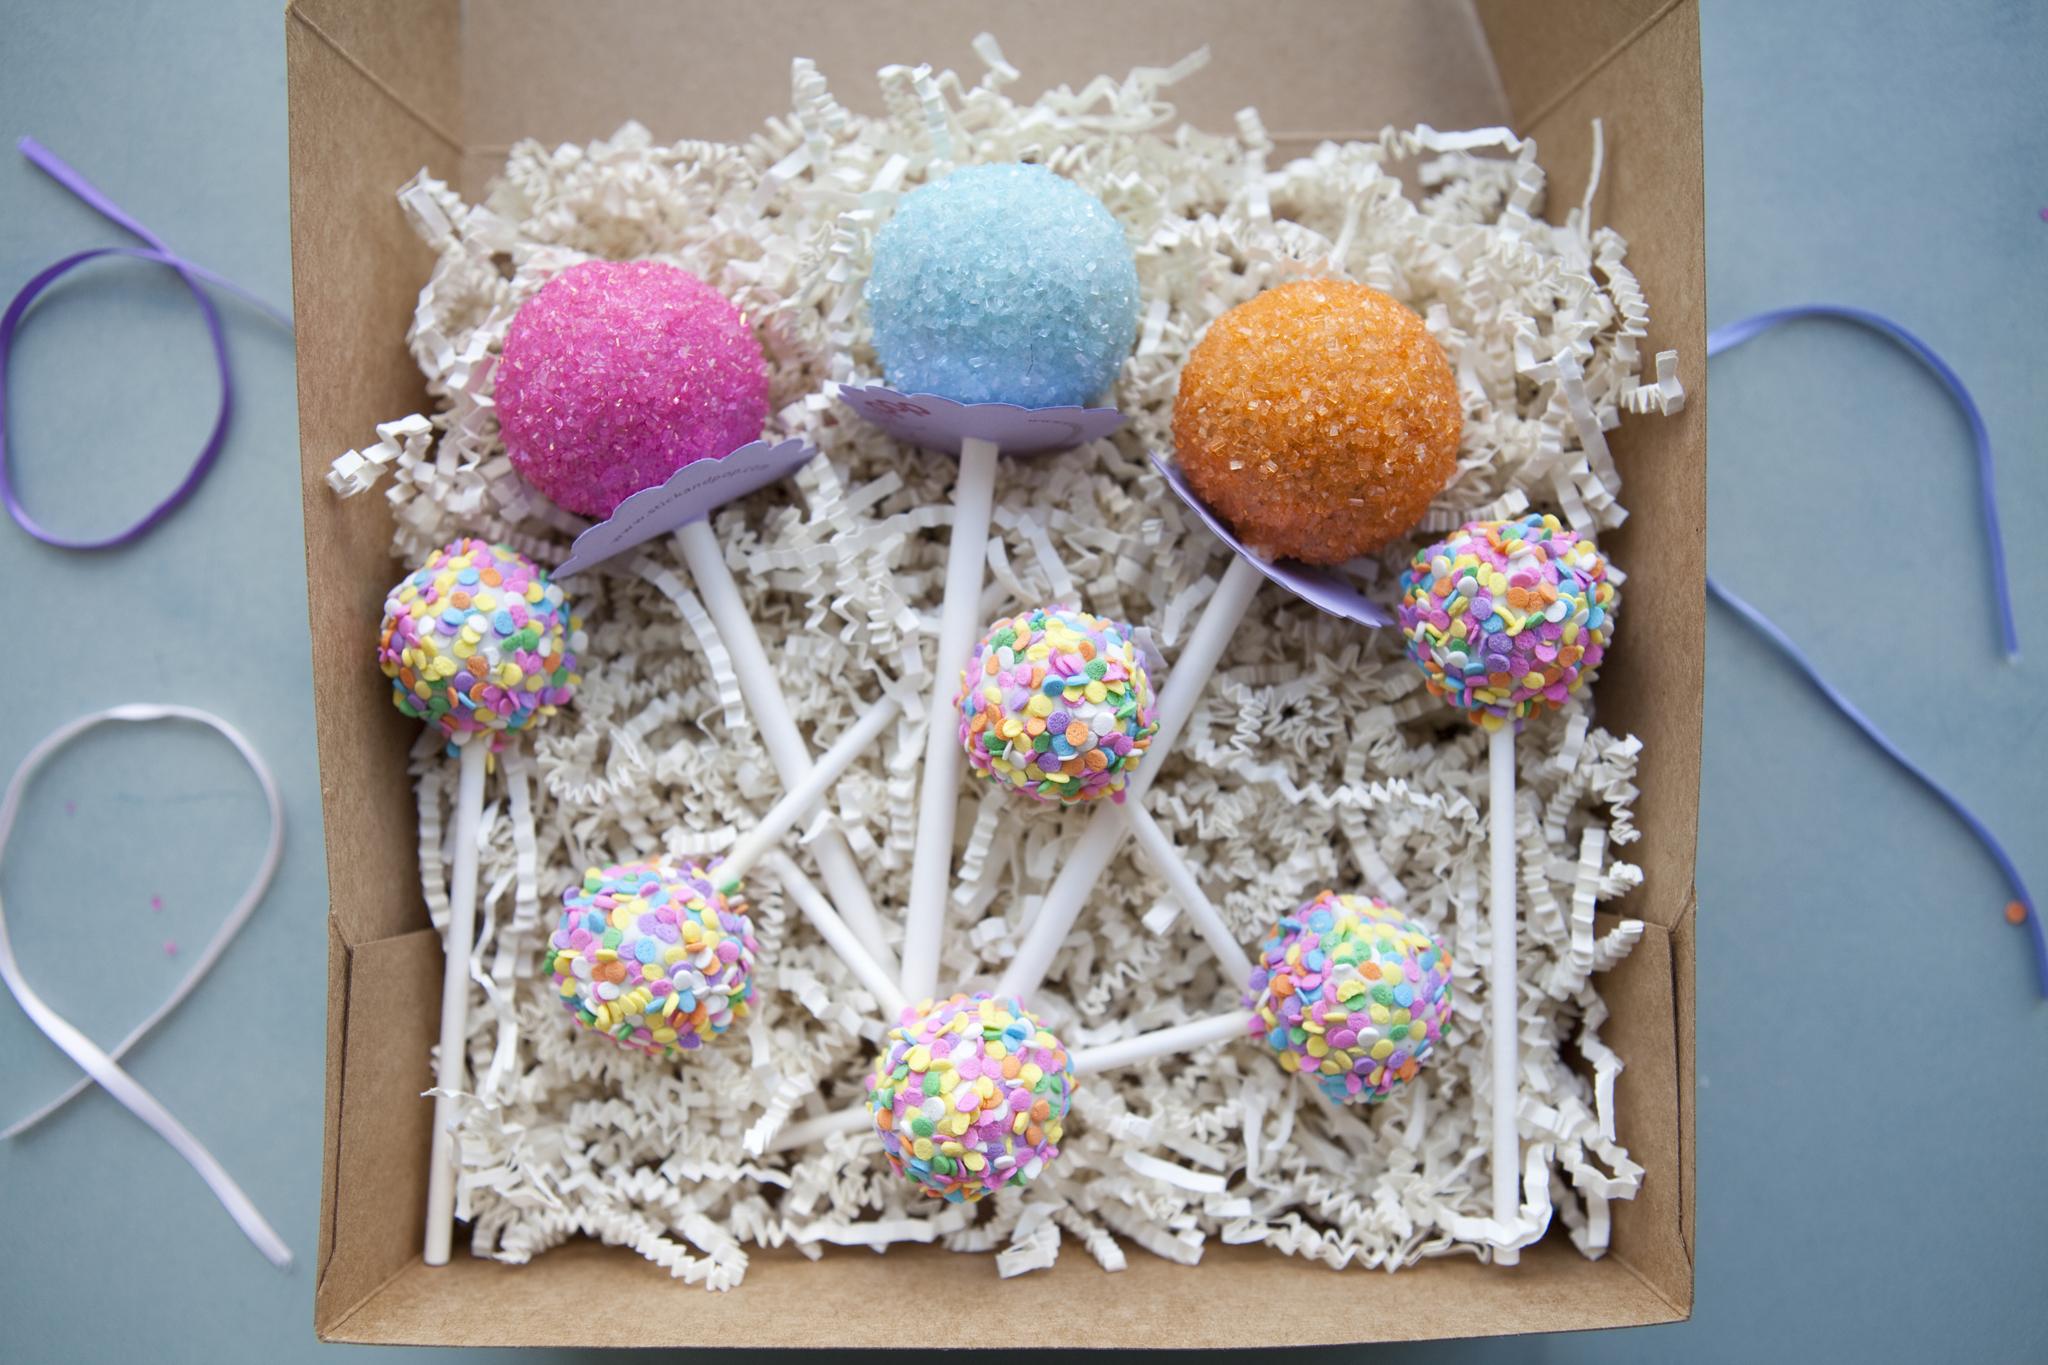 Cutest way to eat cake: Stick&Pop cake pops